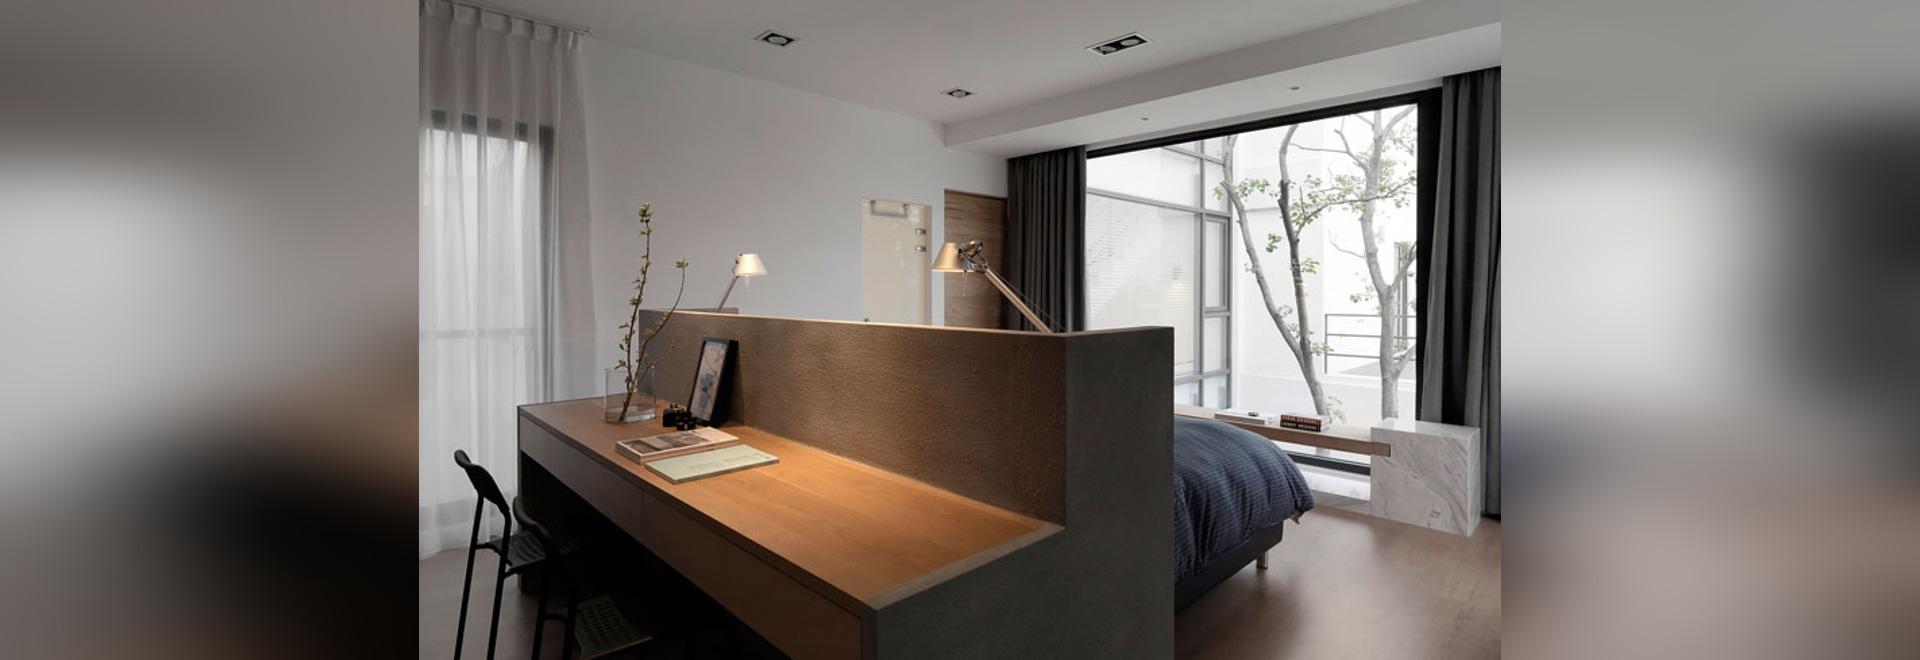 Bedroom Design Idea – A Desk Built Into The Back Of The Headboard